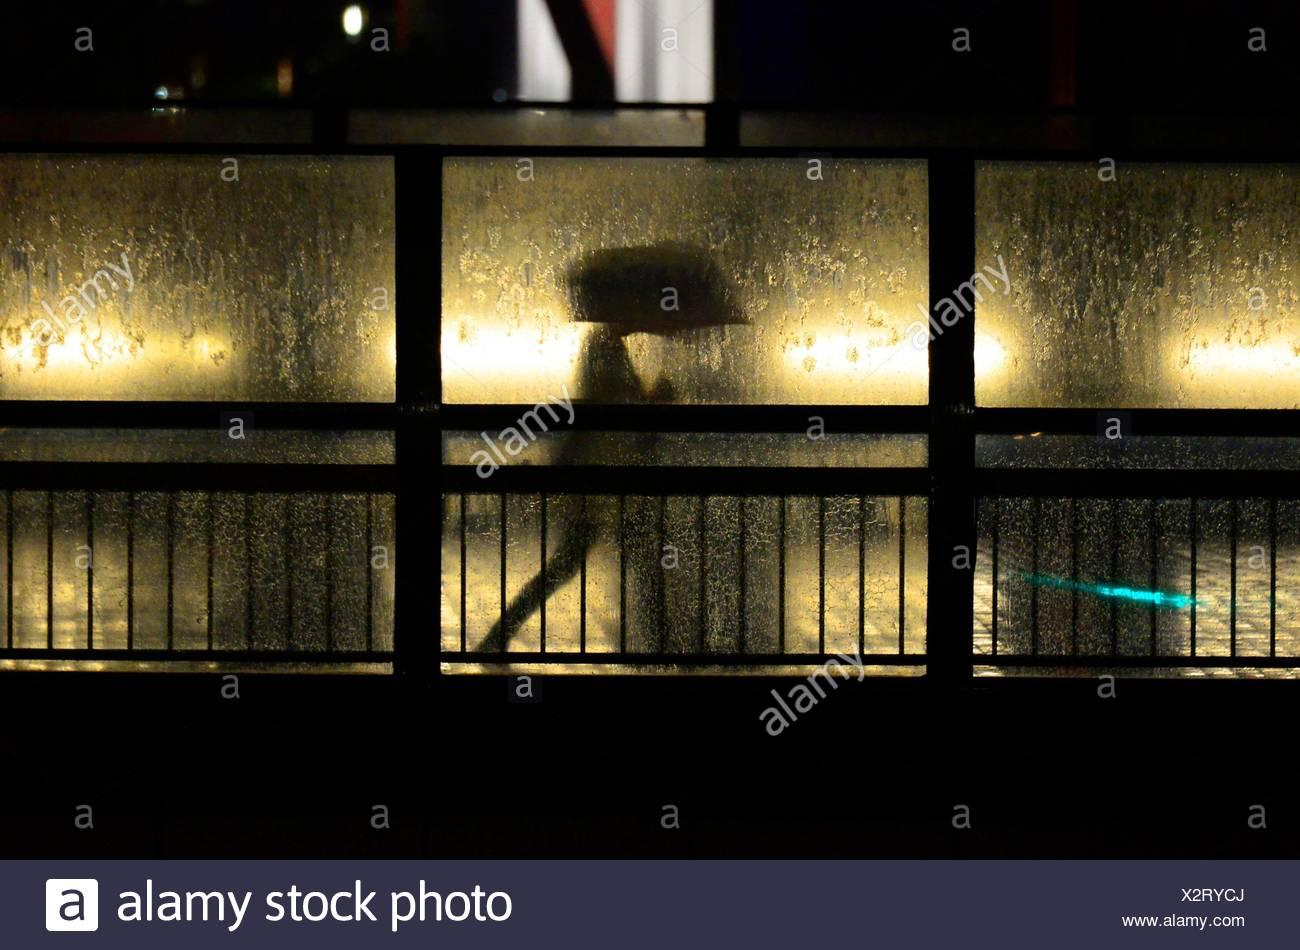 Silueta de Hombre sujetando un paraguas, Tokio, Japón, Asia. Imagen De Stock